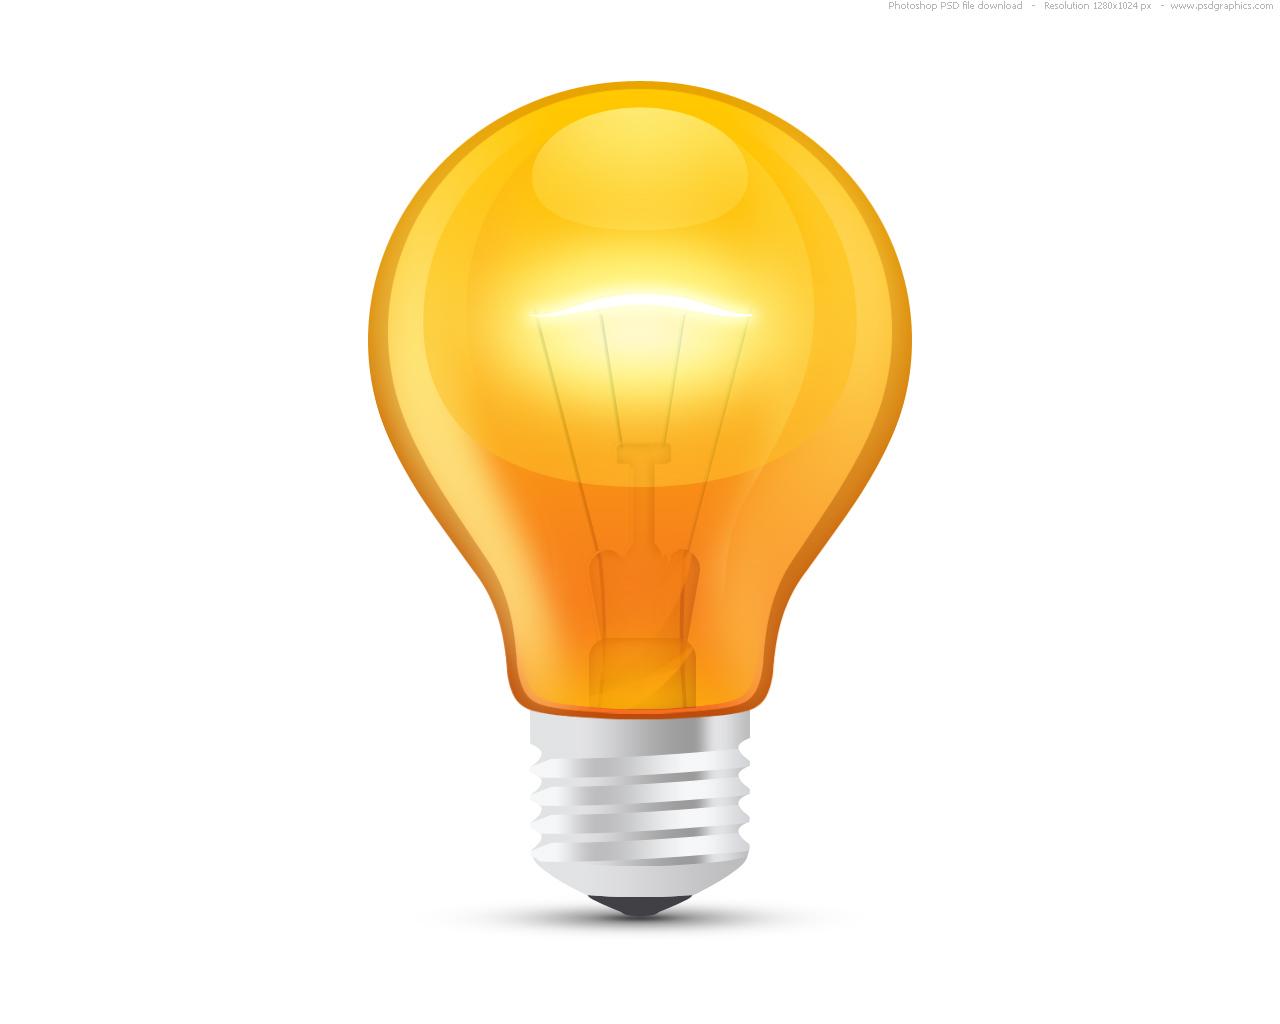 Idea clipart electric bulb Psdgraphics  bulb orange clipart